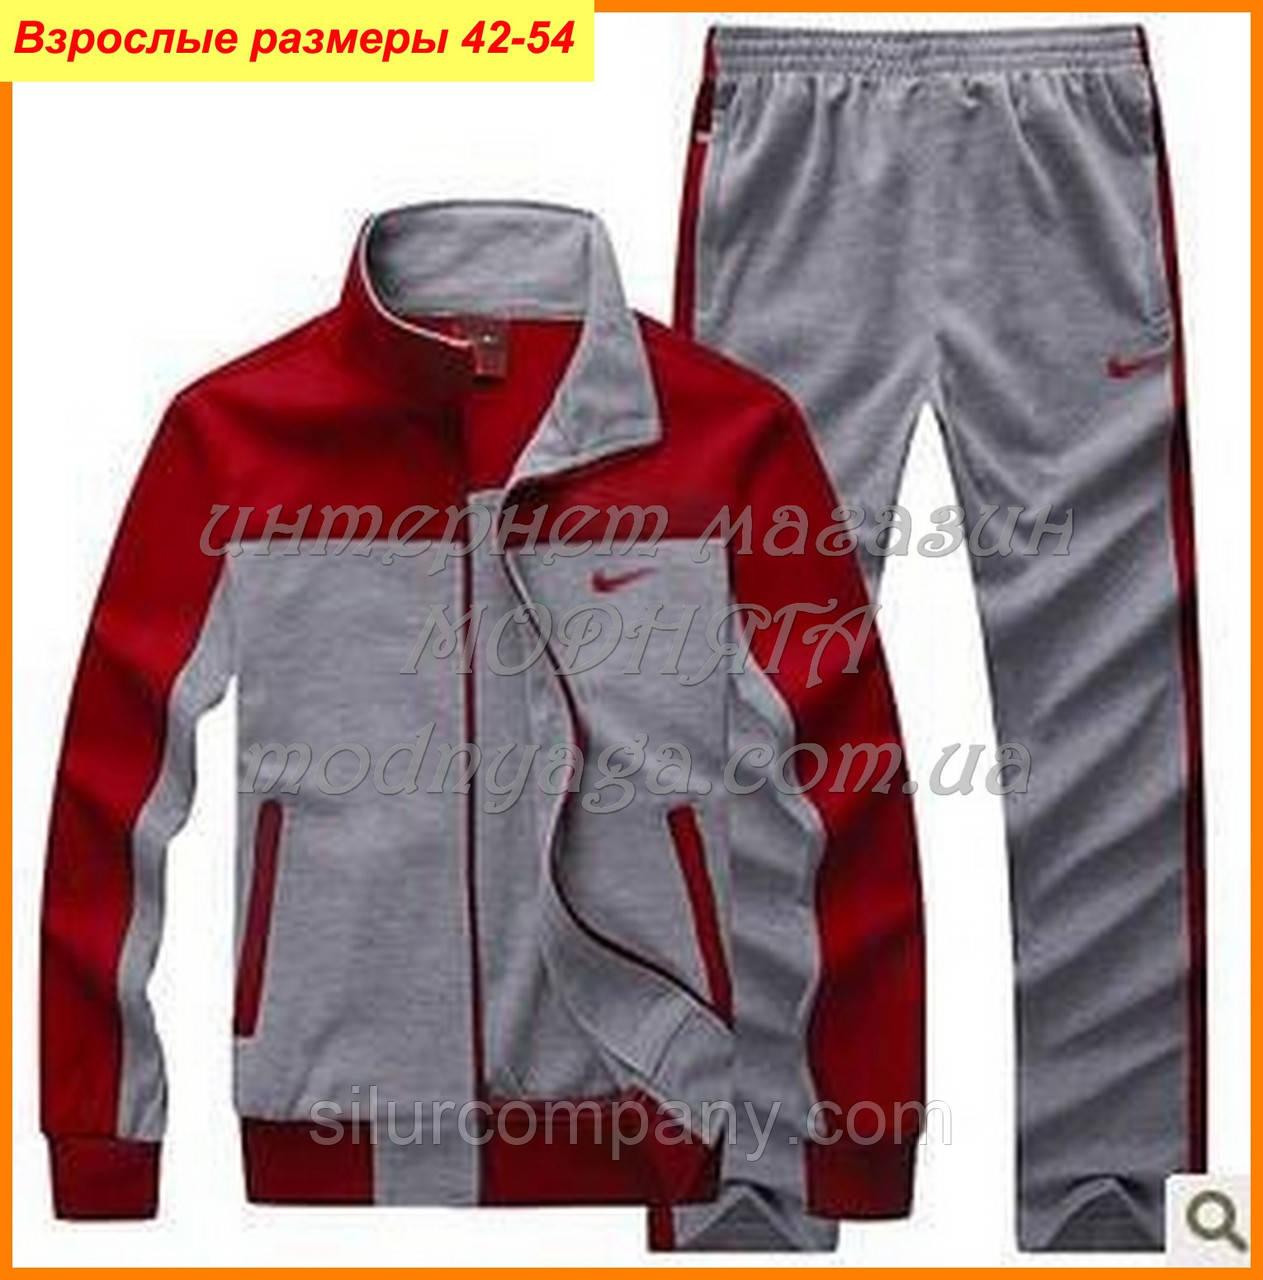 8ed9f2249be9 Спортивний костюм найк   nike одежда  продажа, цена в Киеве, в Харькове. спортивные  костюмы от